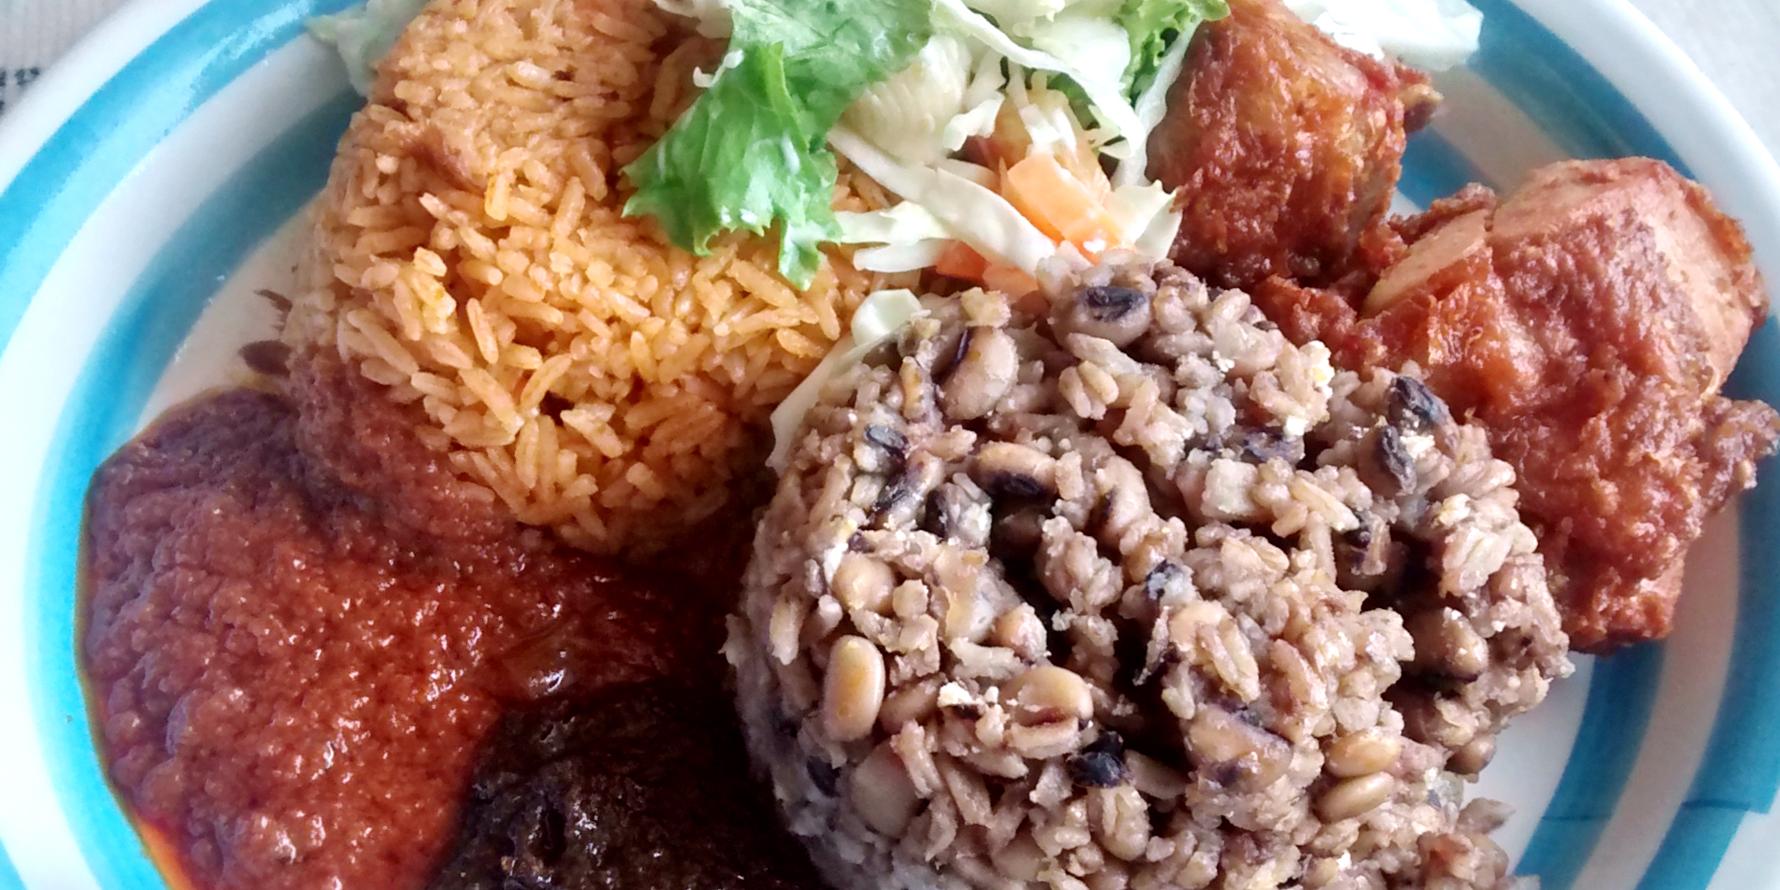 Cuisine traditionnelle ghanéenne